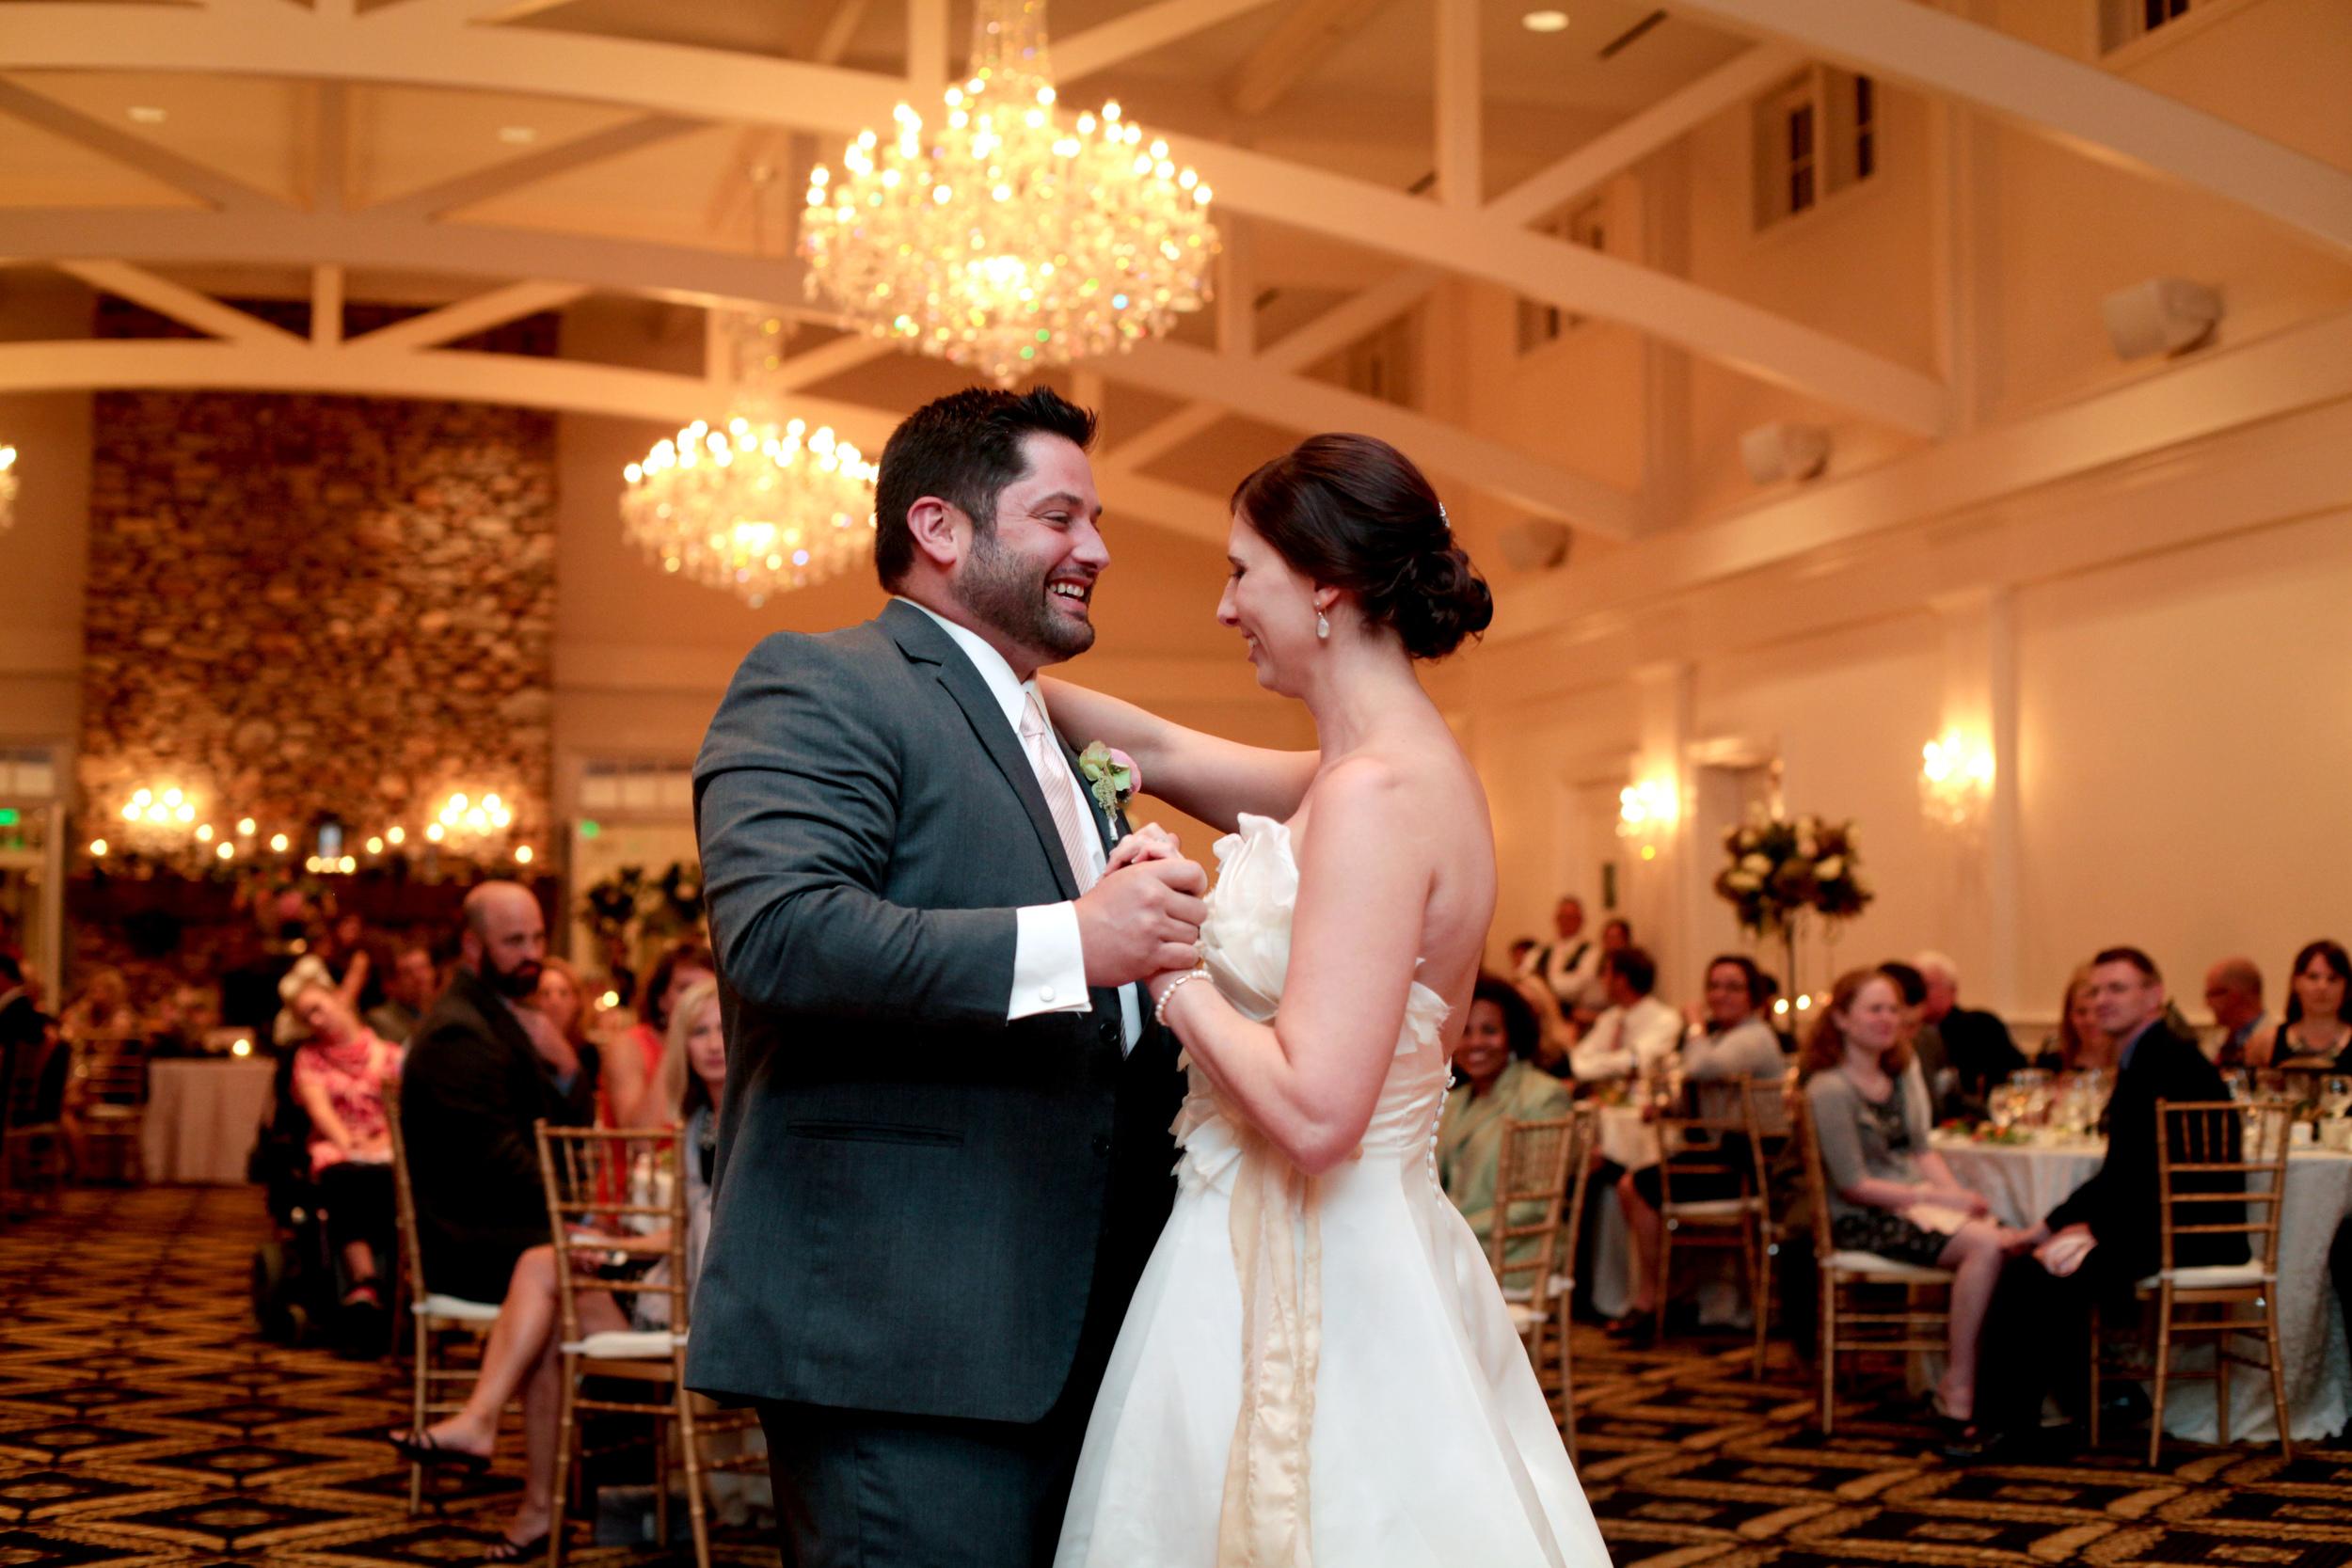 trump-national-golf-course-first-dance-charlotte-wedding-painter-ben-keys-wed-on-canvas-live-wedding-artist